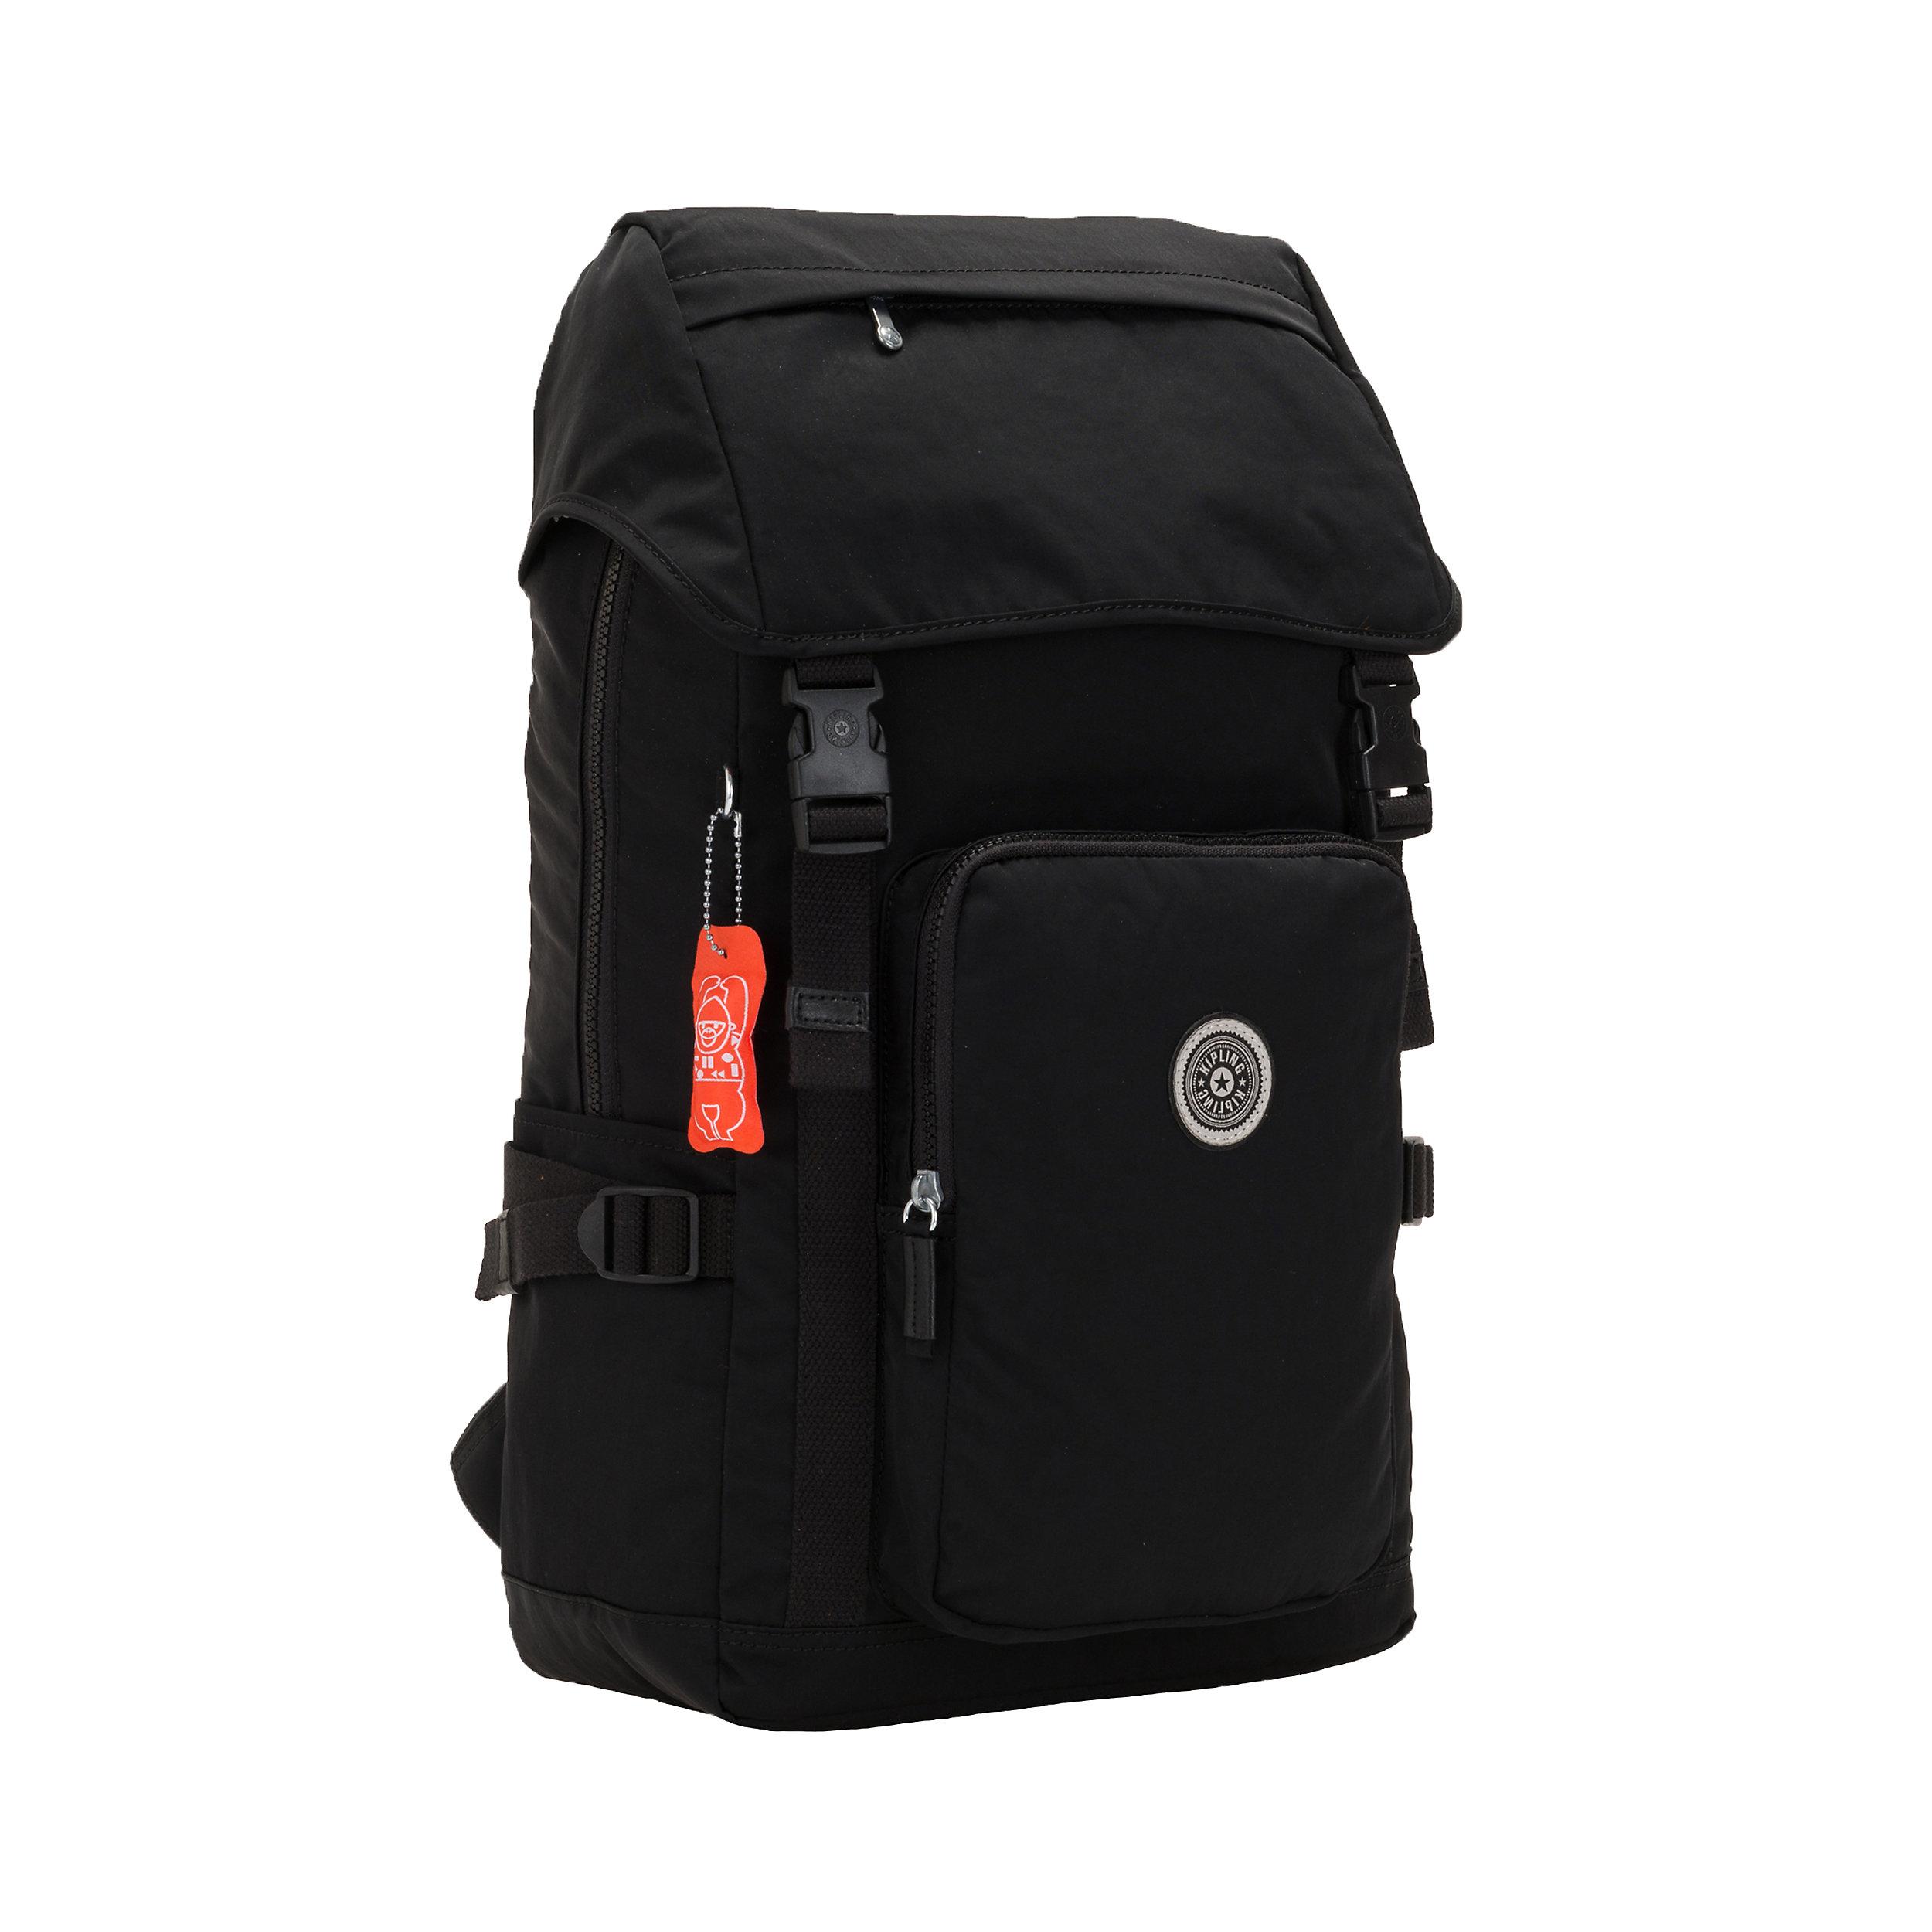 "Backpack Yantis 15"" Boost It M 20.5 Liter"